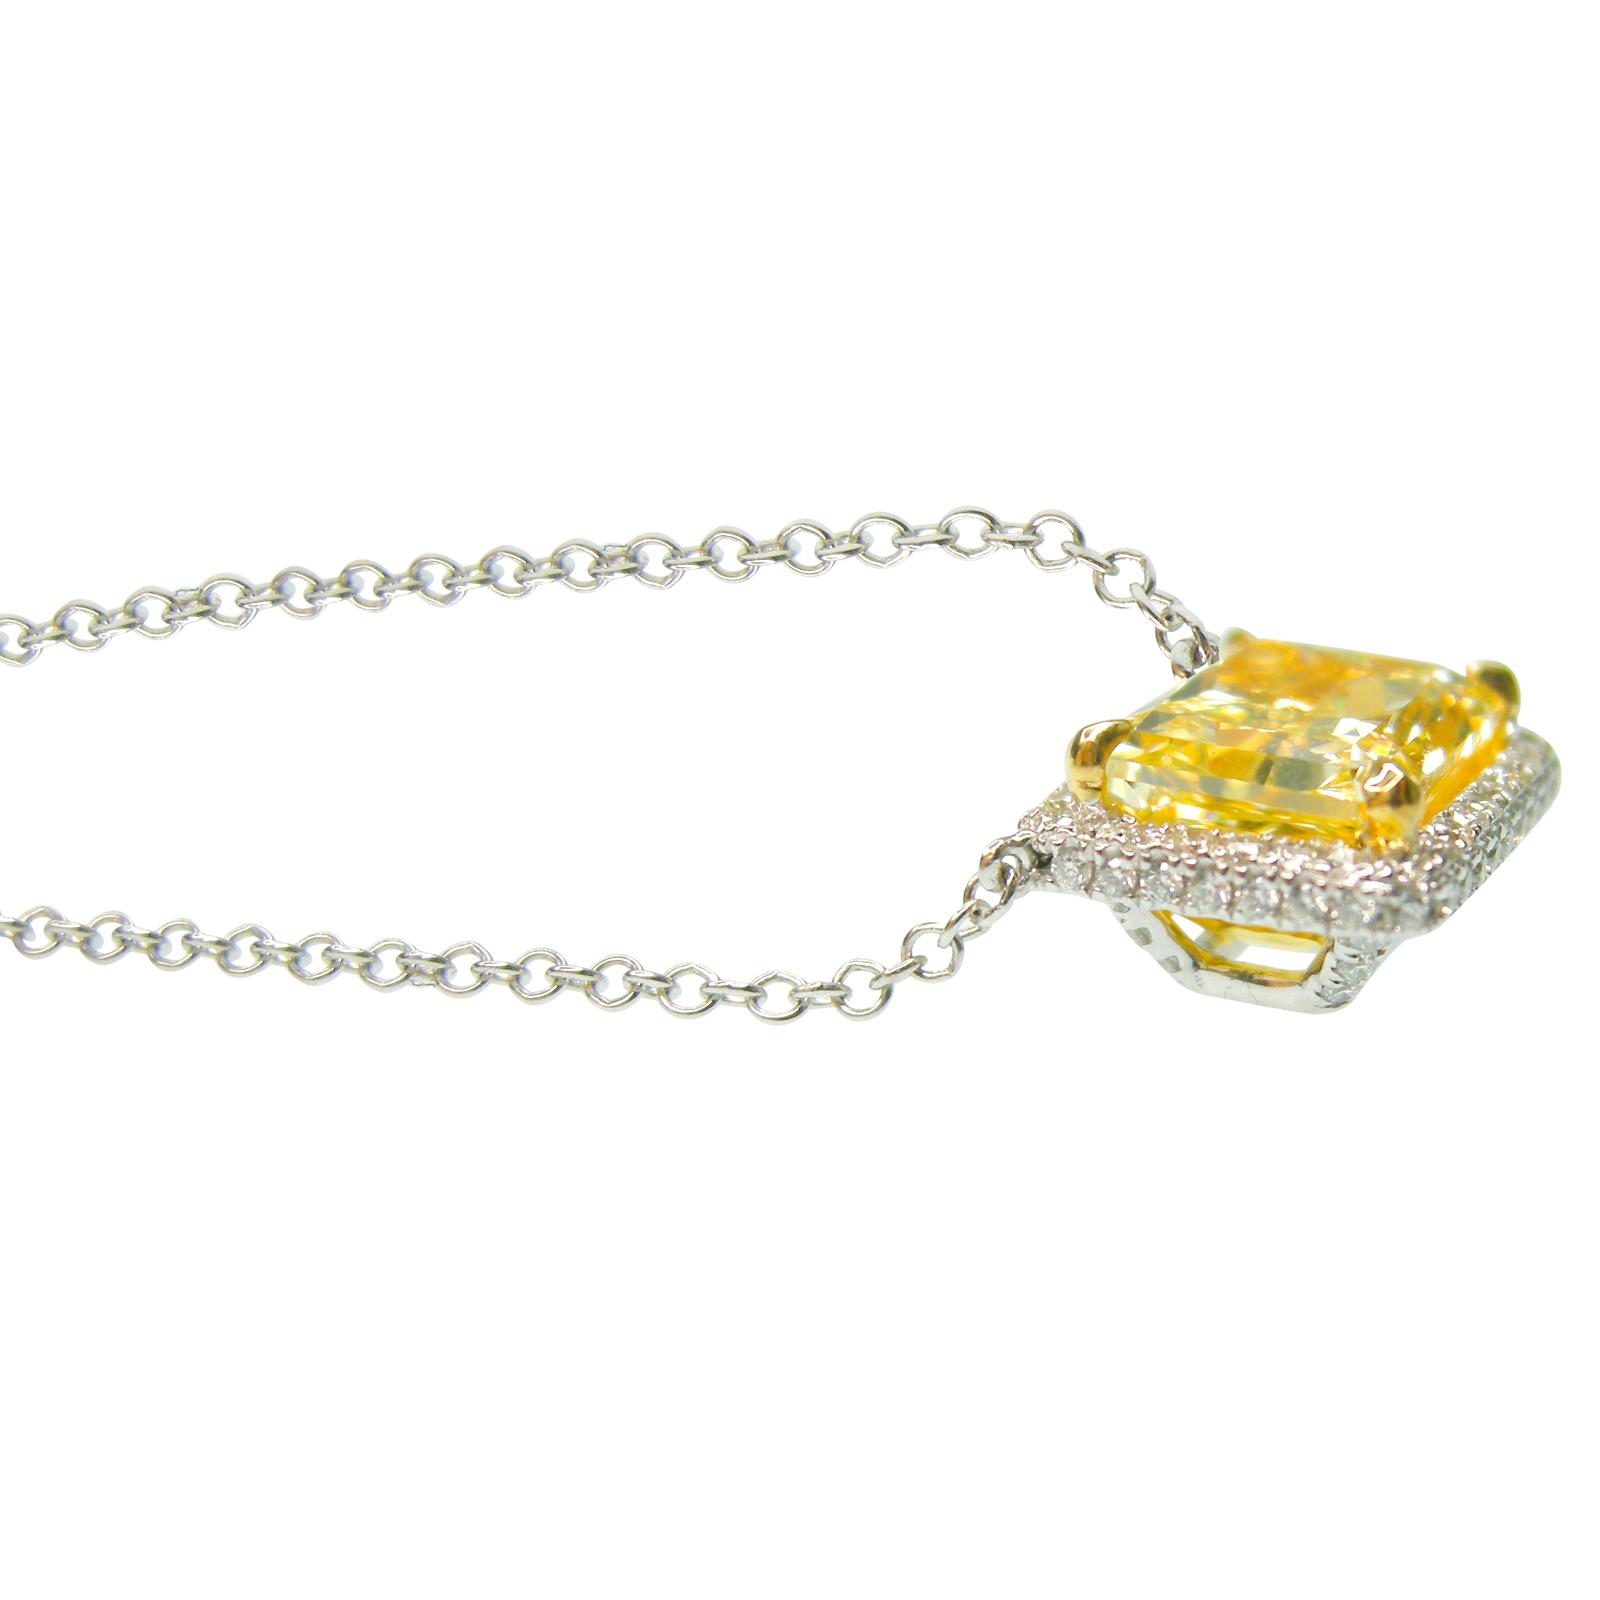 YELLOW DIAMOND NECKLACE RADIANT CUT